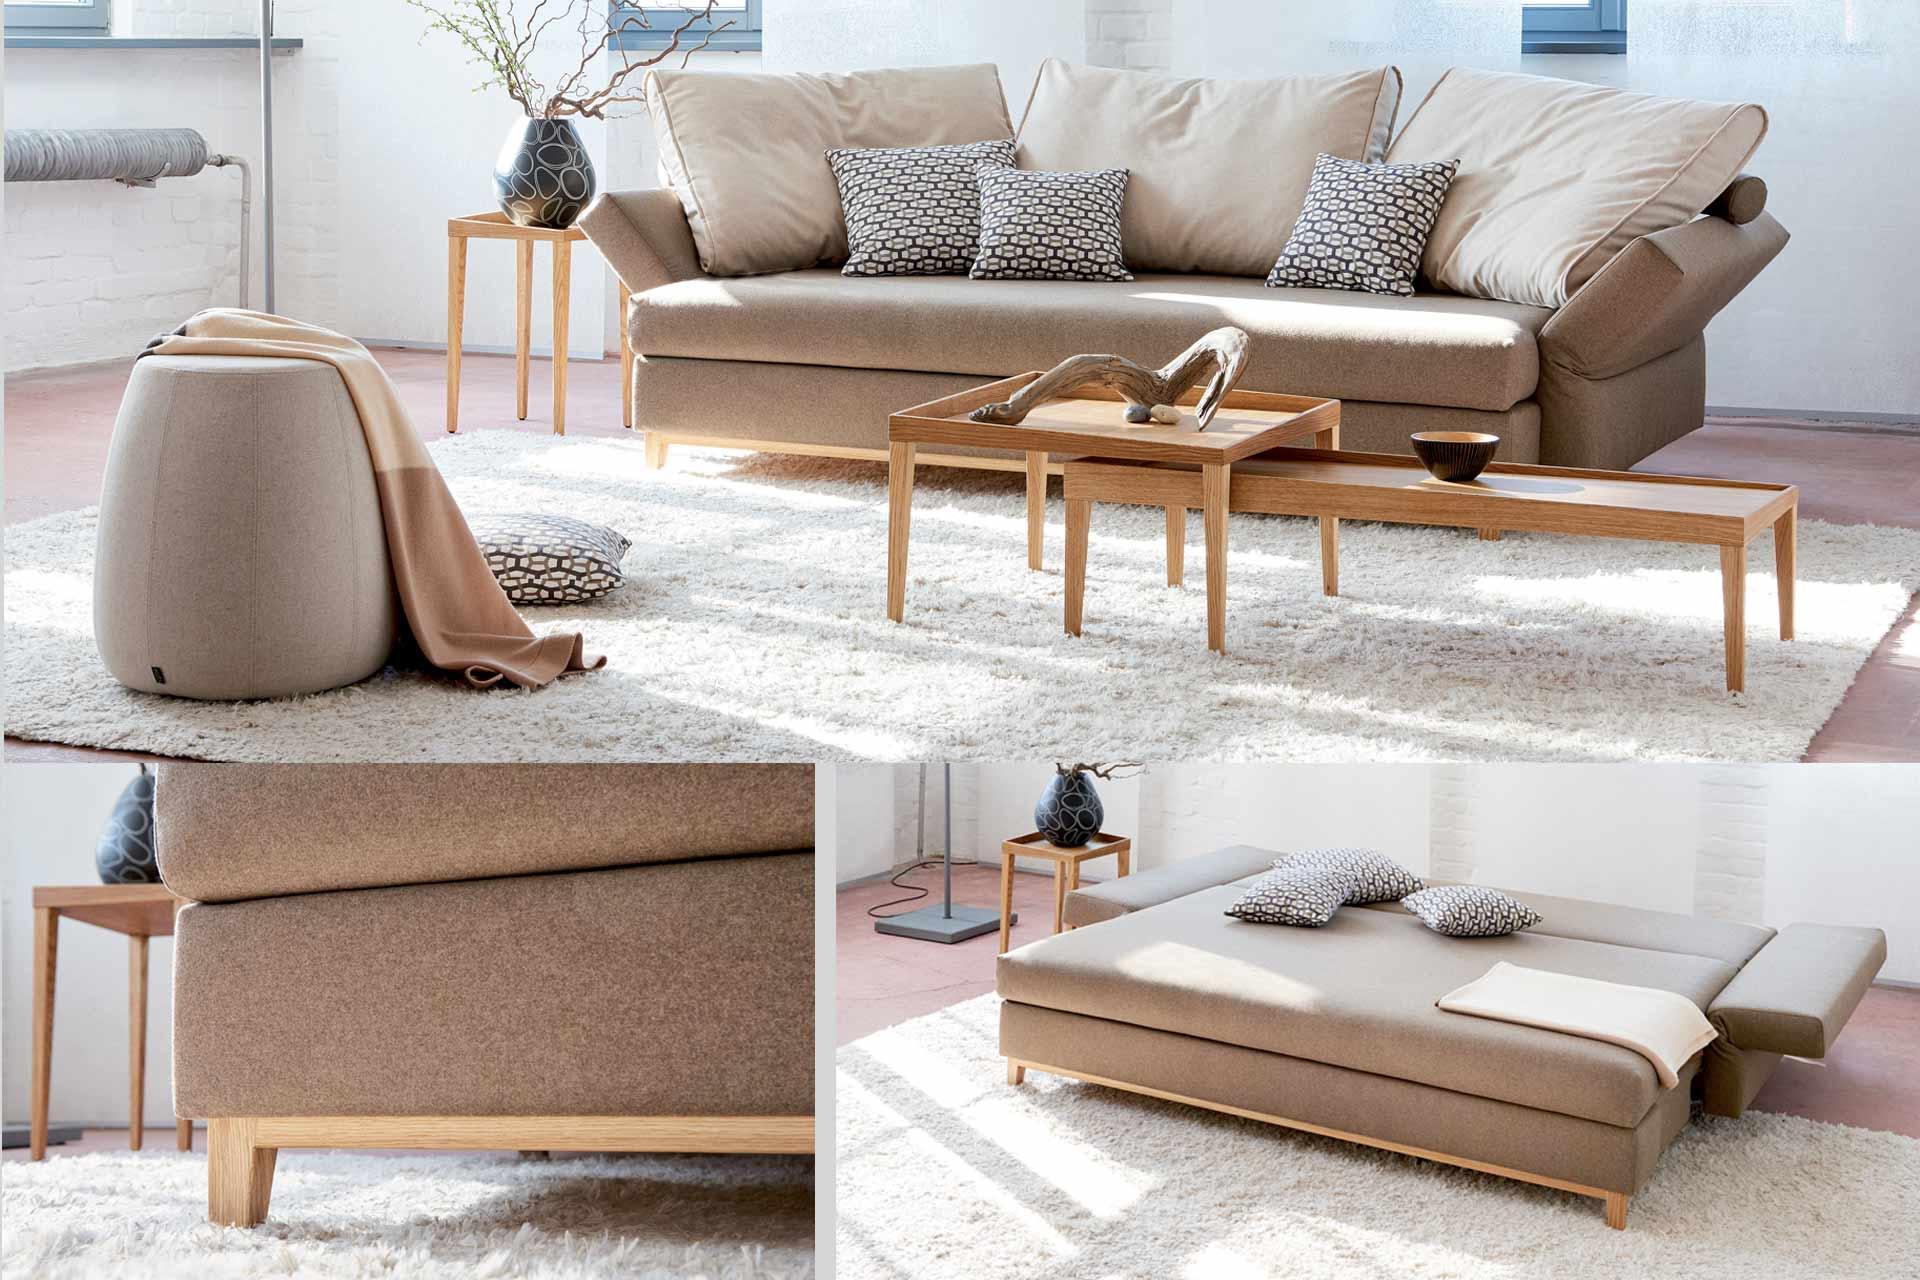 Full Size of Goodlife Love Sofa Signet Couch Good Life Furniture Amazon Malaysia Schlafsofa 200 Xxl In Naturtnen Wohnopposition Berlin Mit Relaxfunktion Elektrisch Big Sofa Goodlife Sofa